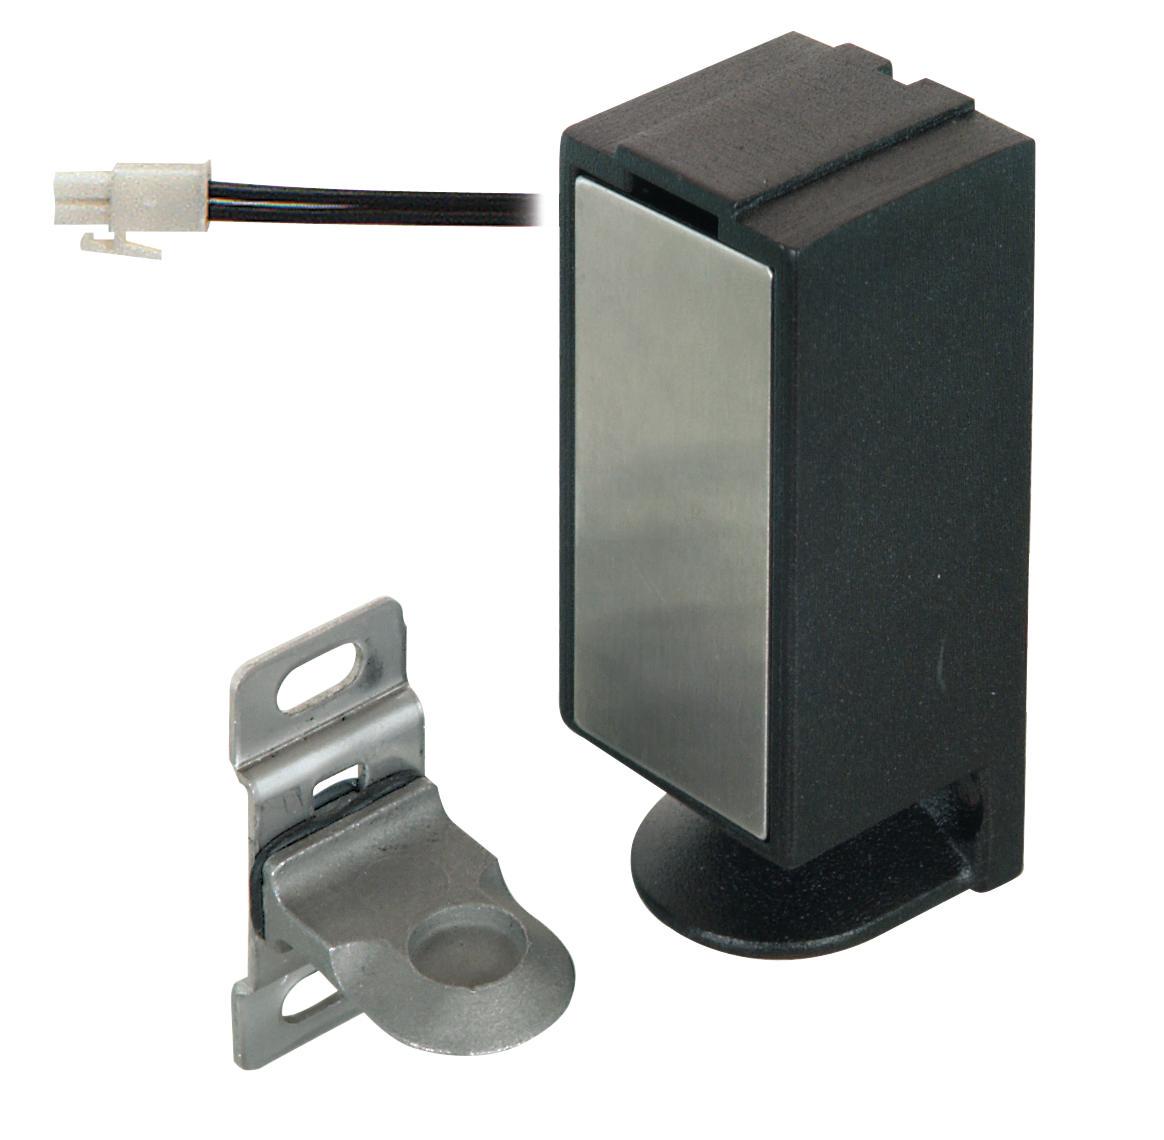 Hafele 237.56.062 Electric Cabinet Lock